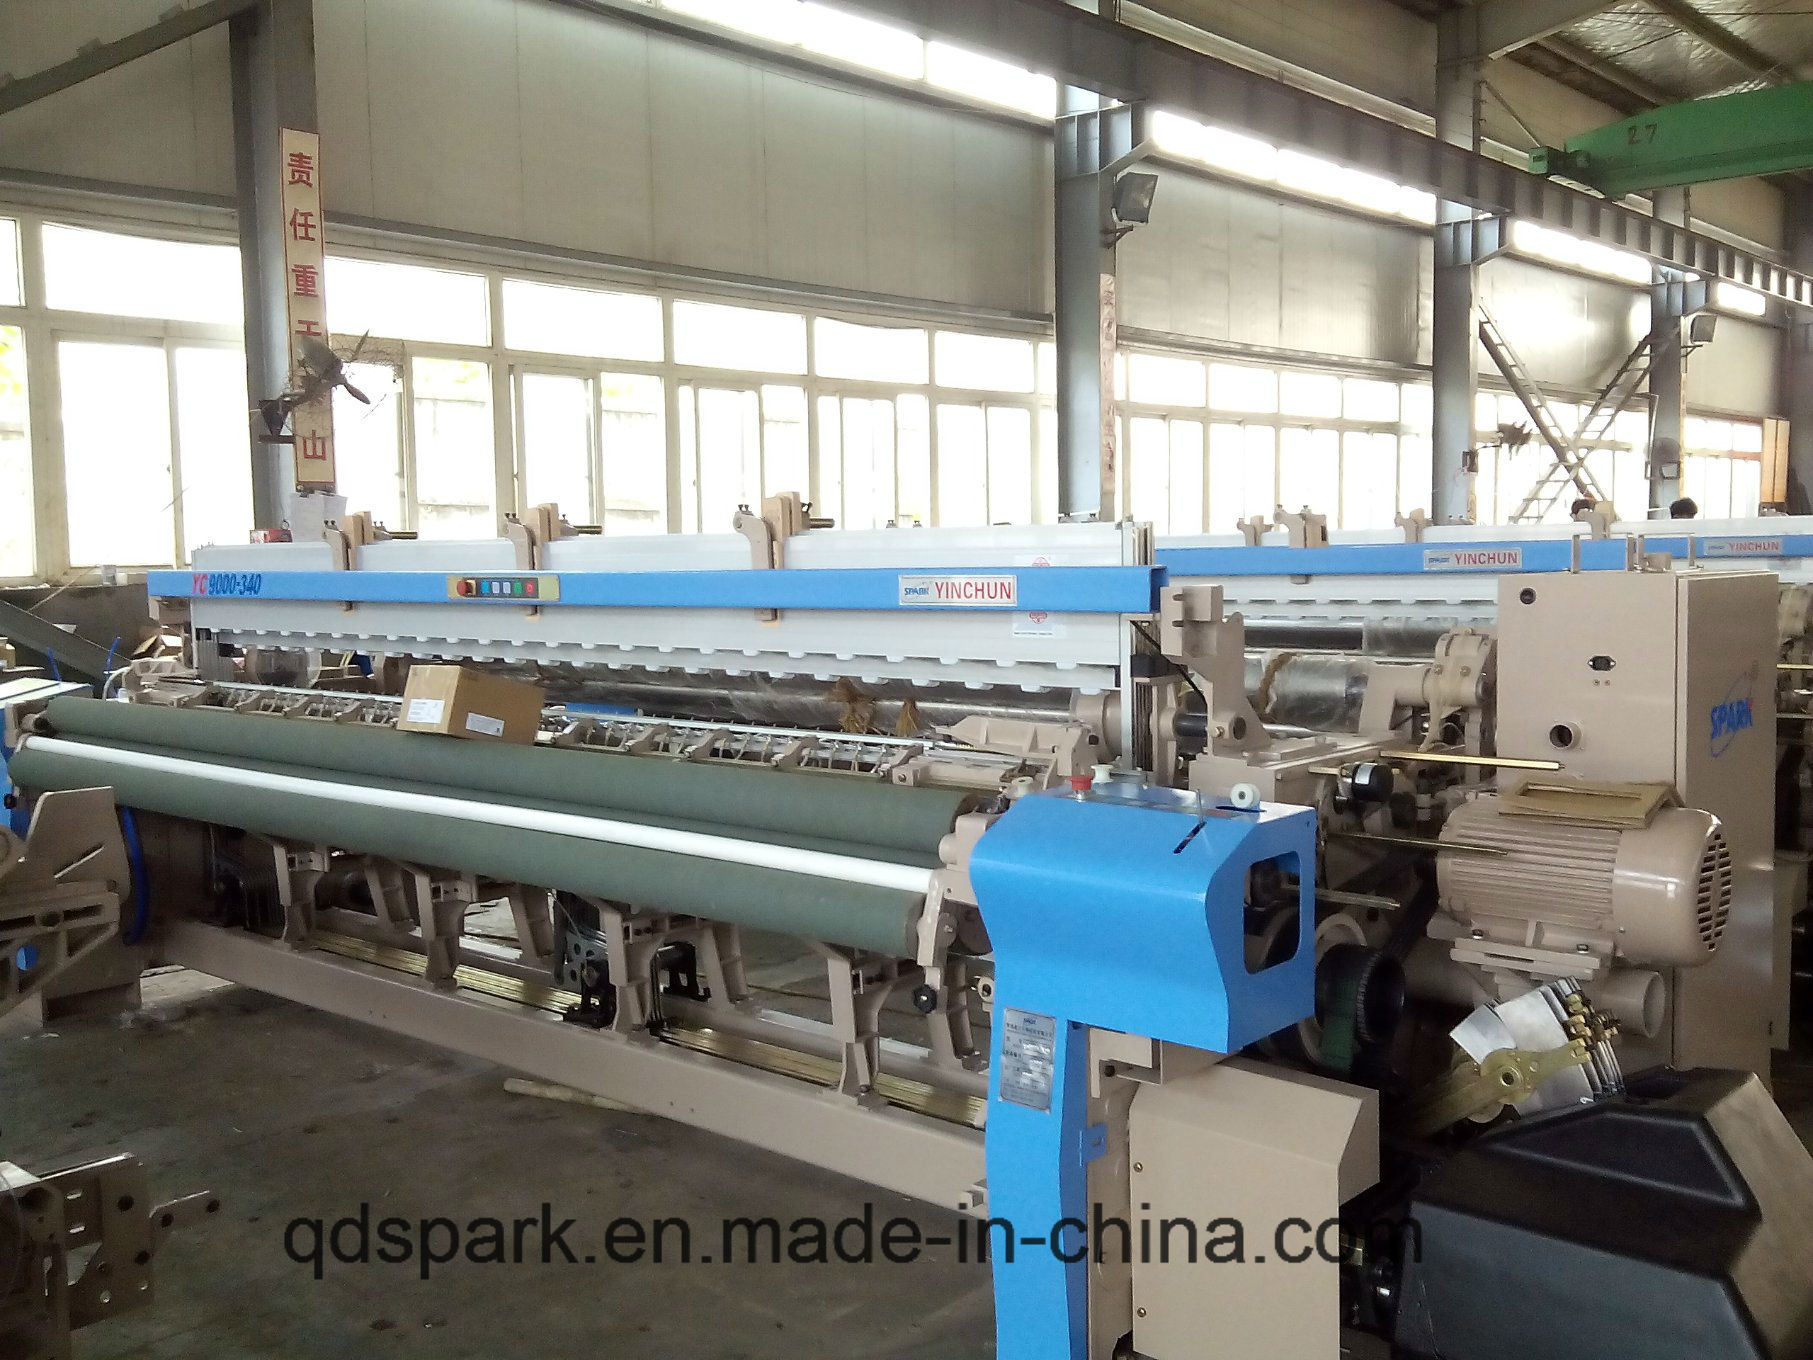 340cm High Speed Air Jet Weaving Machine